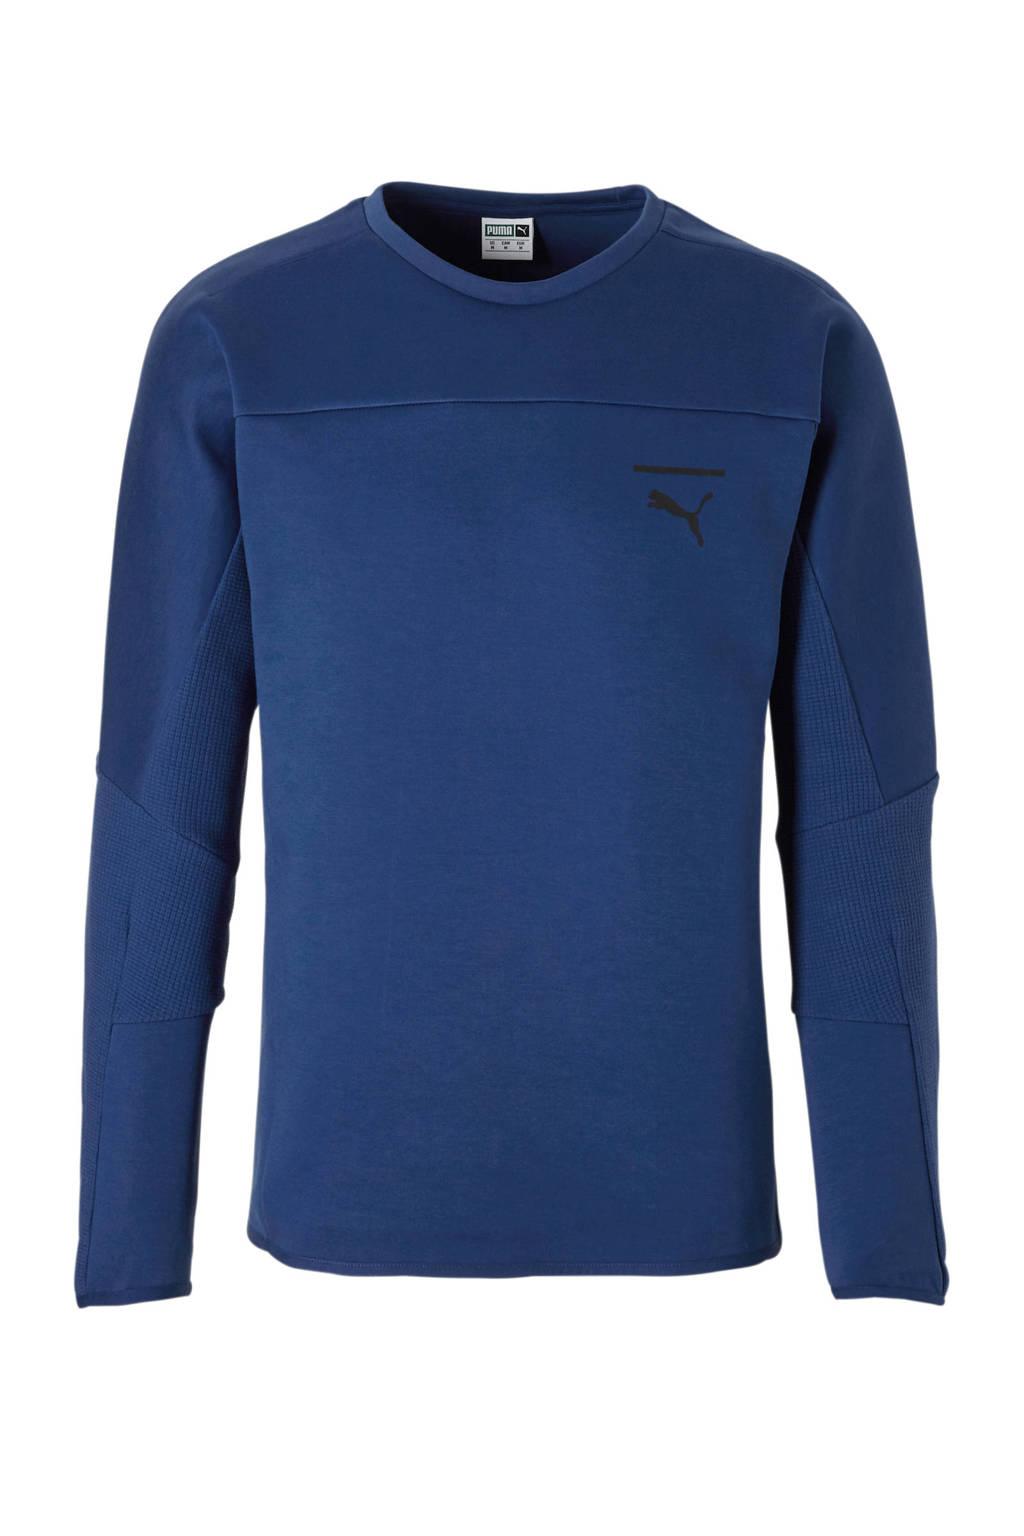 Puma   sweater, Blauw